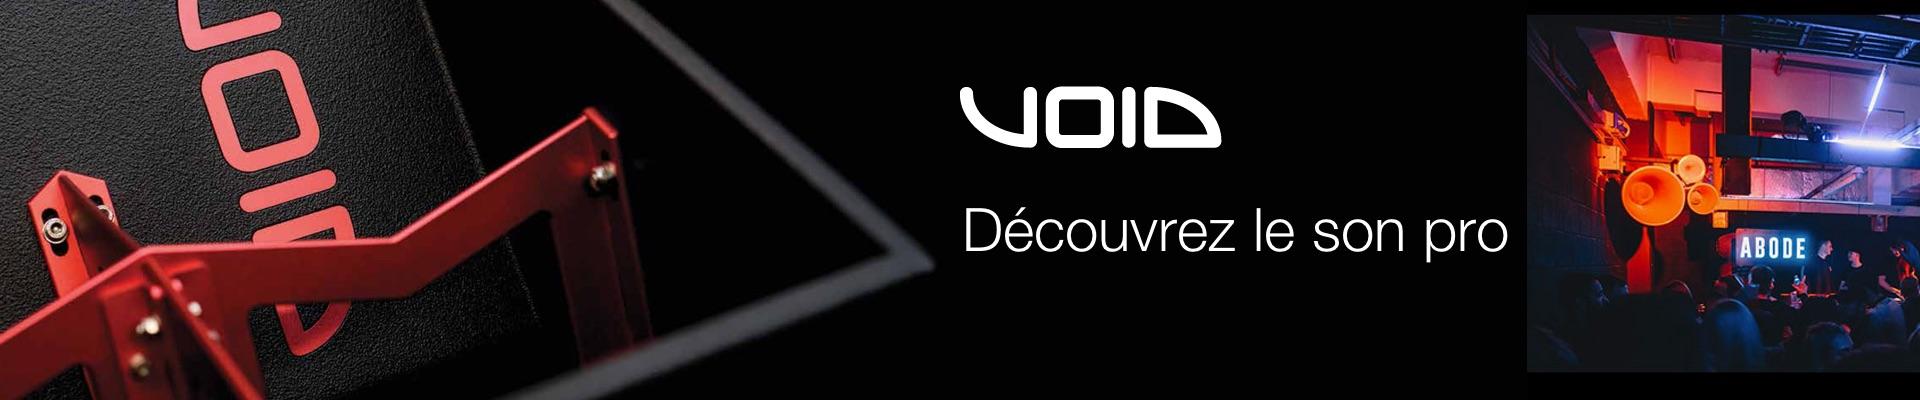 slide-20180701-void-pro